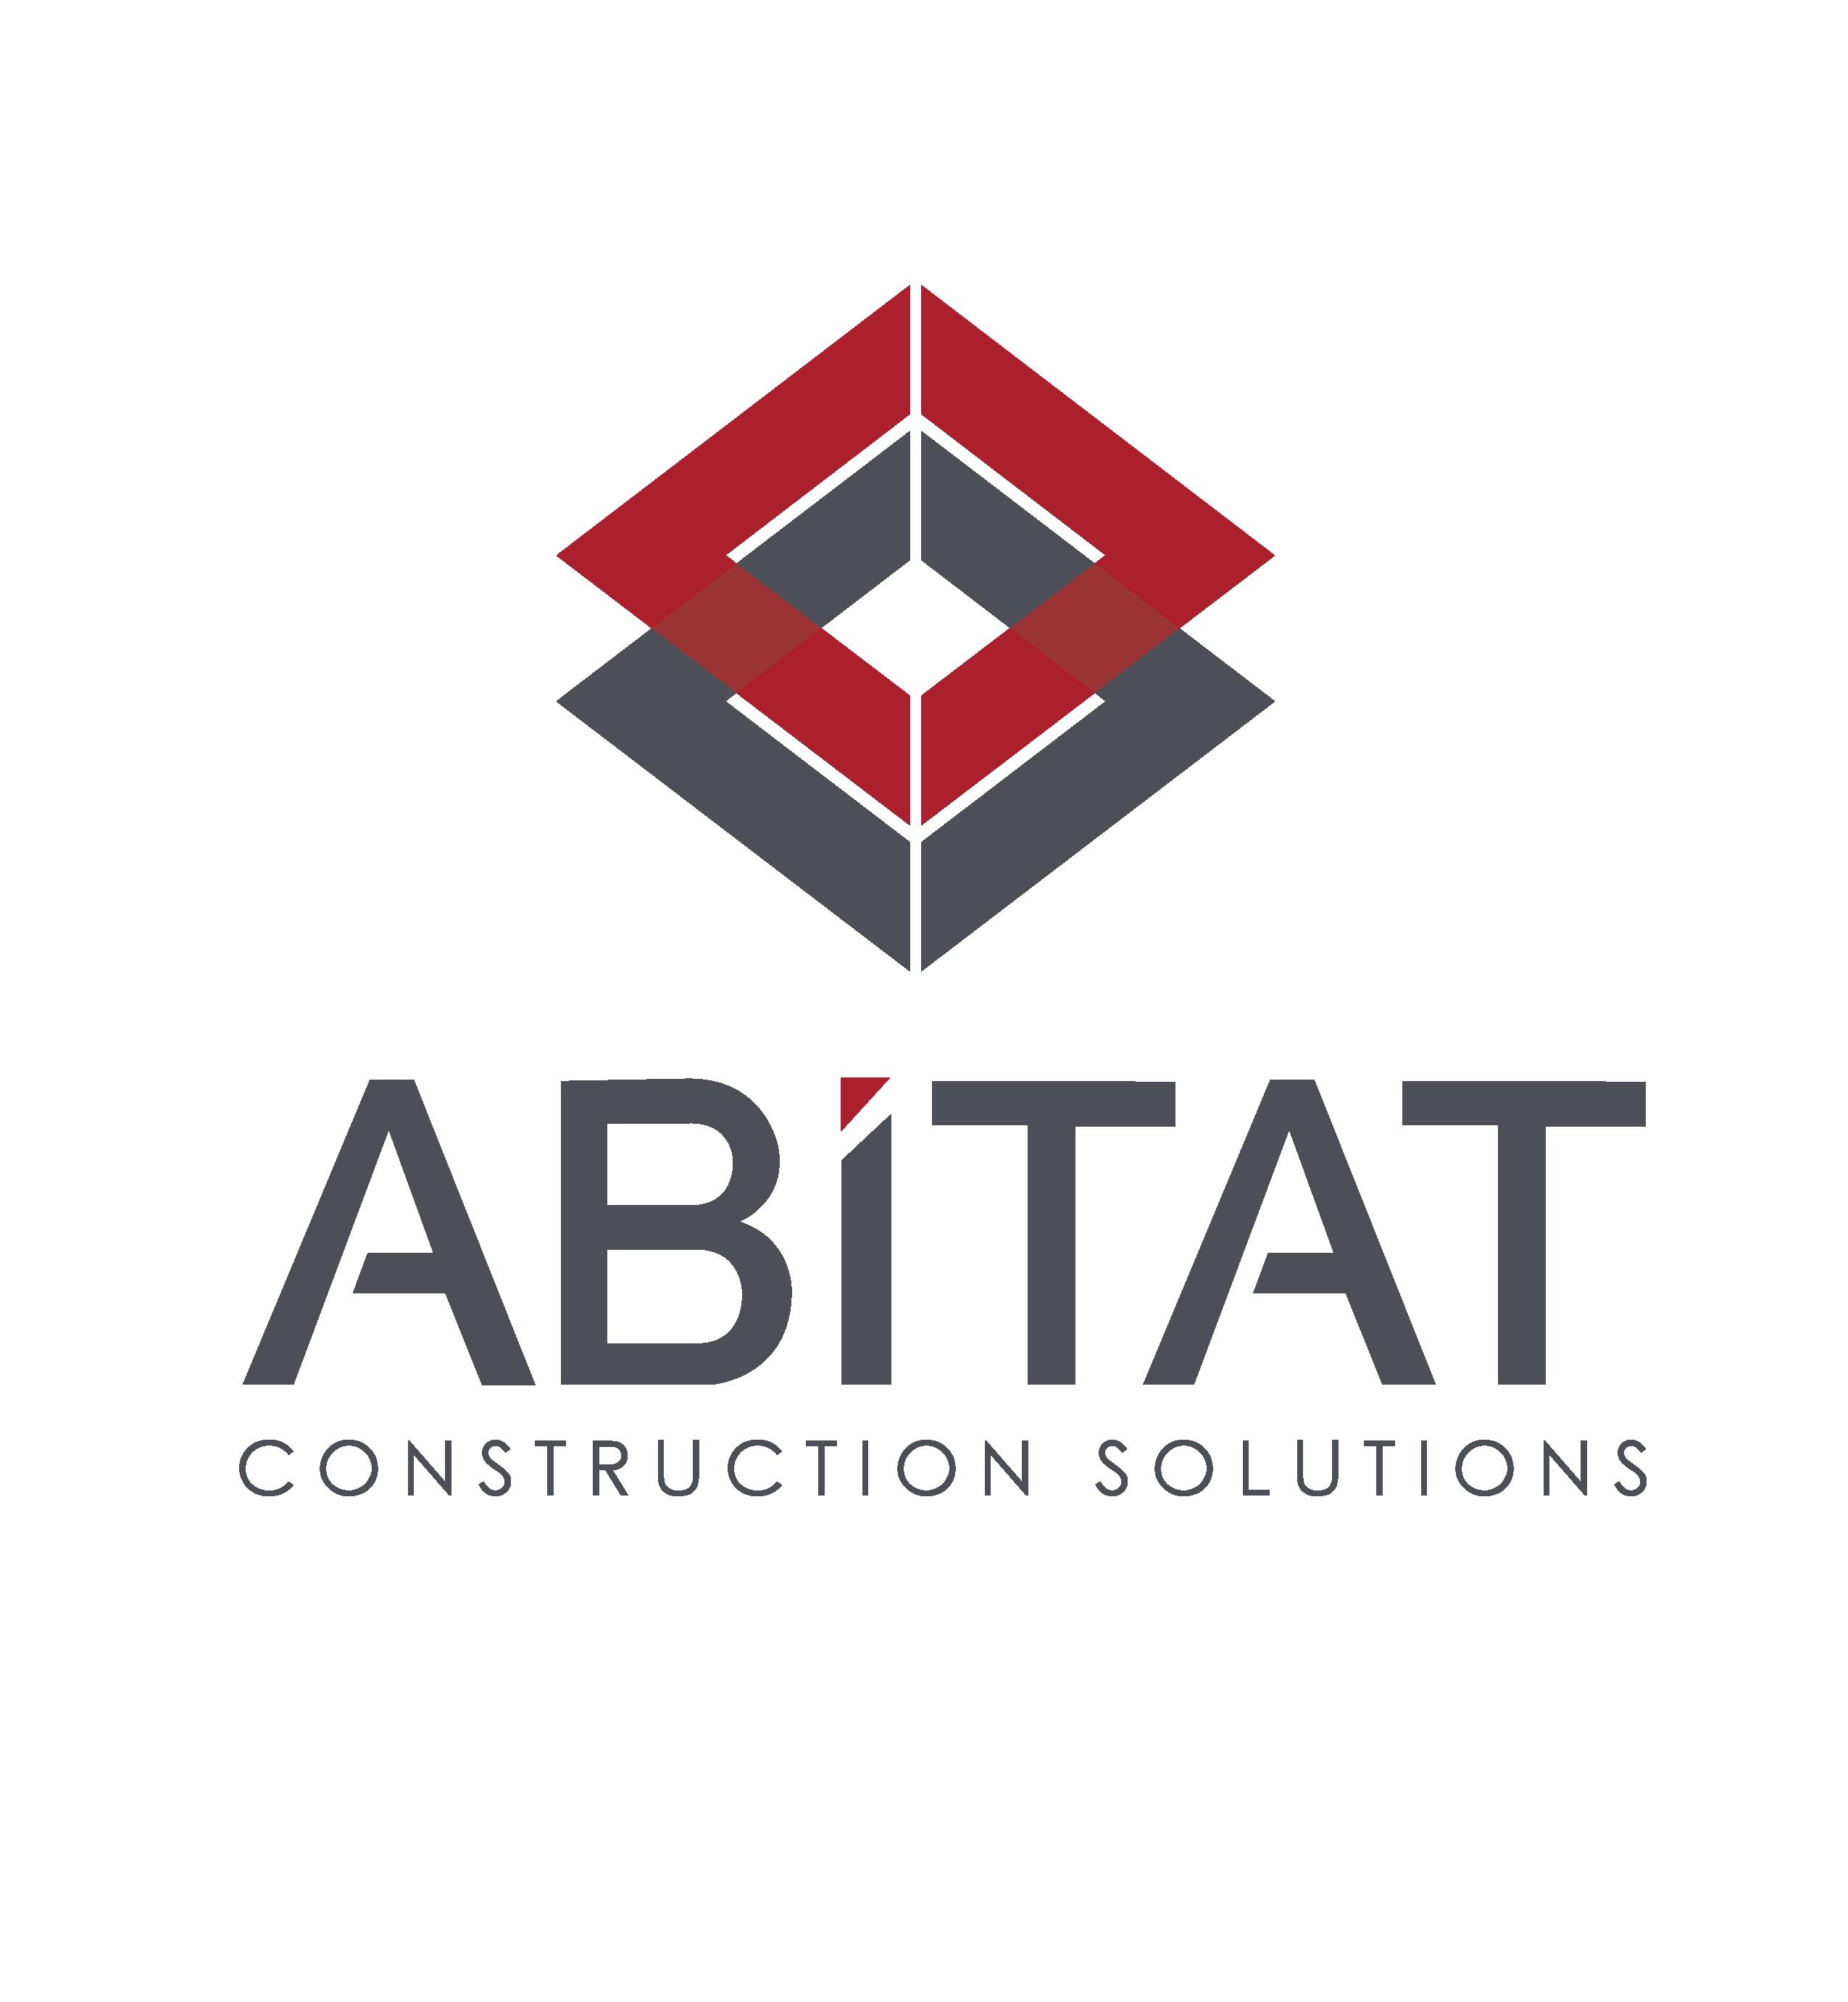 vertical_logo Abitat